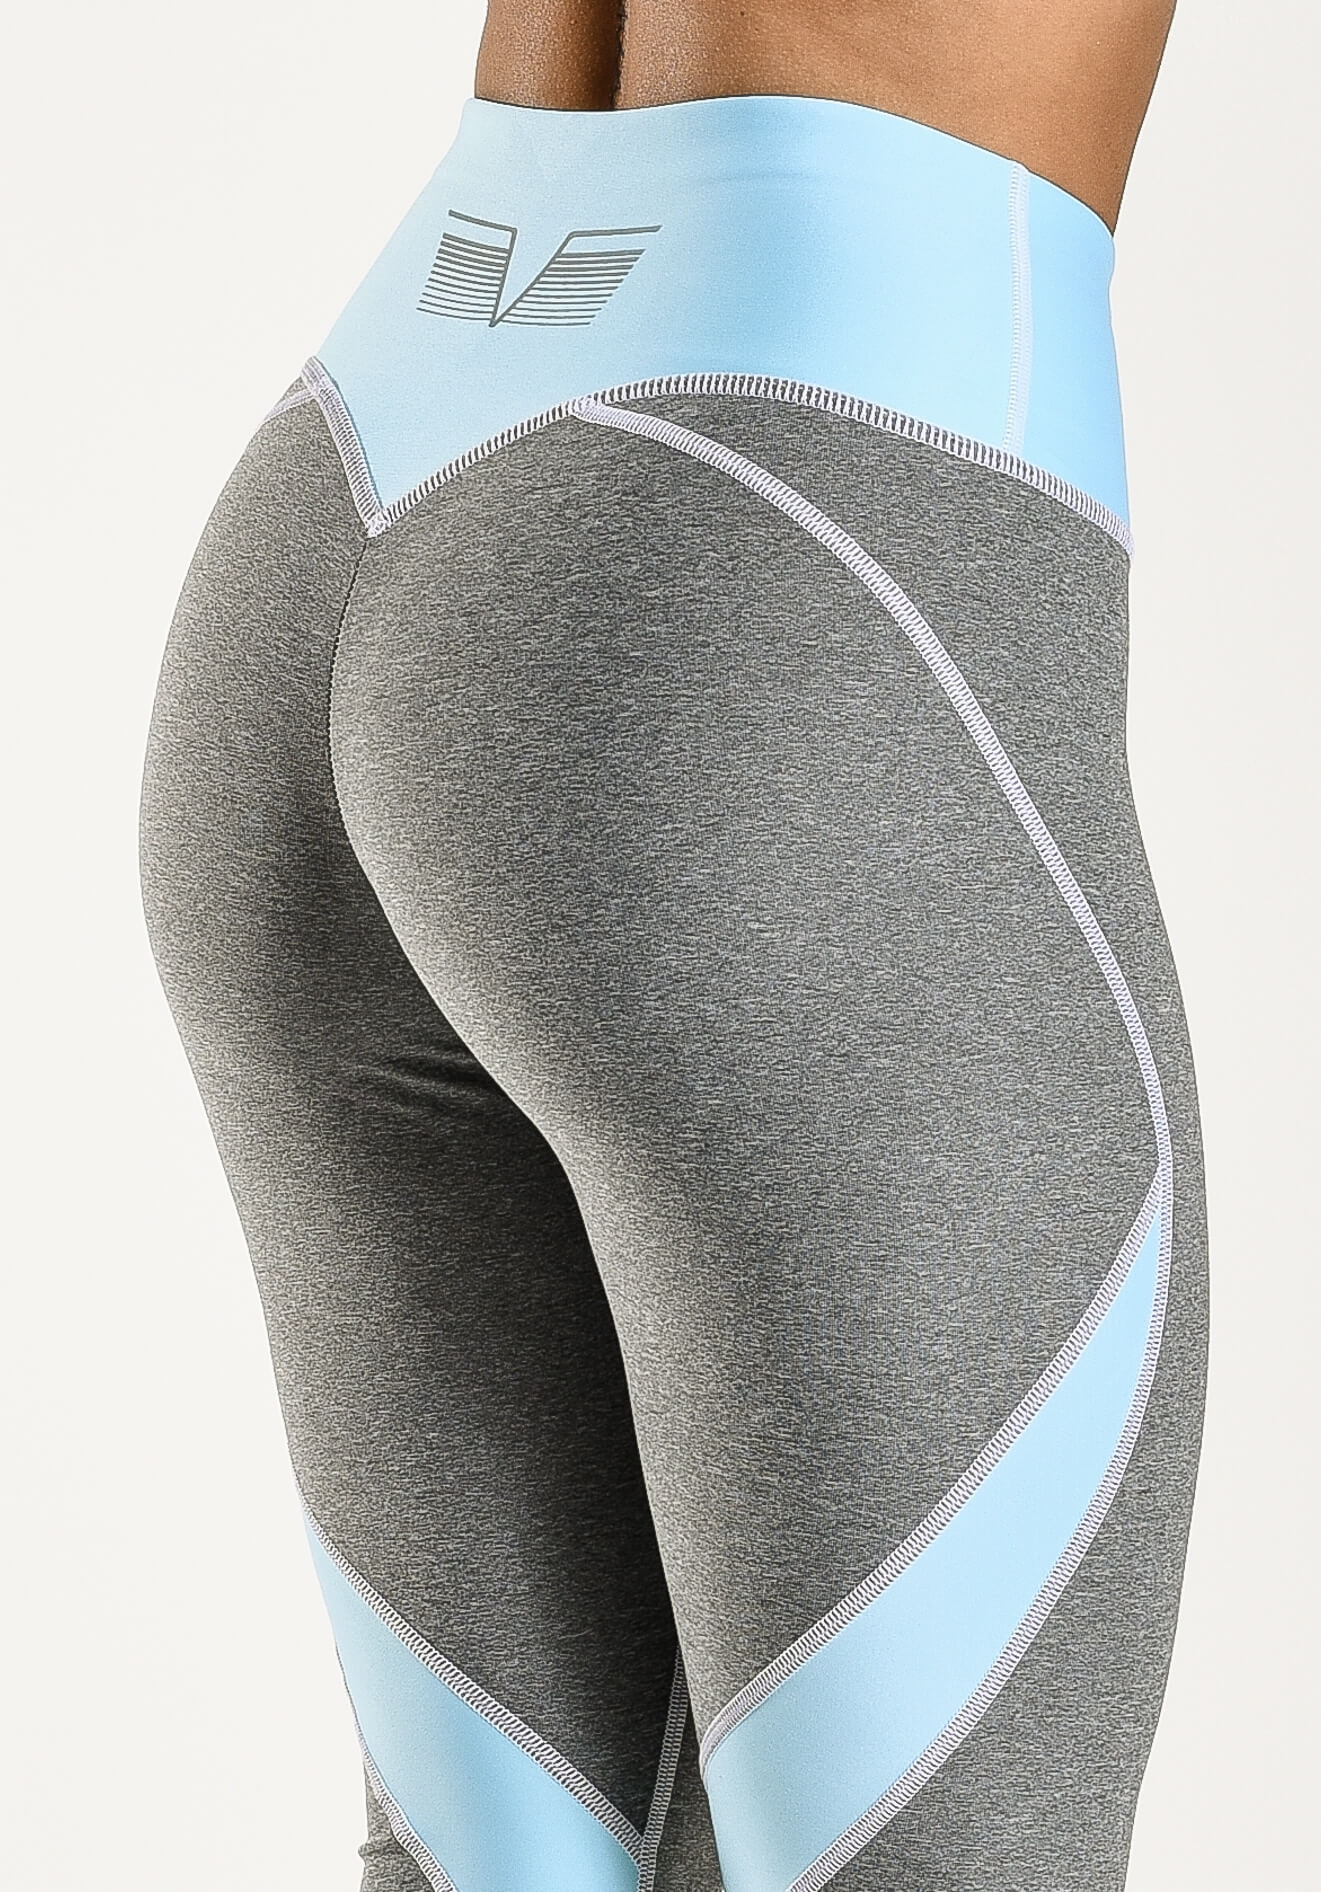 Malibu Swirl Comfort Tights